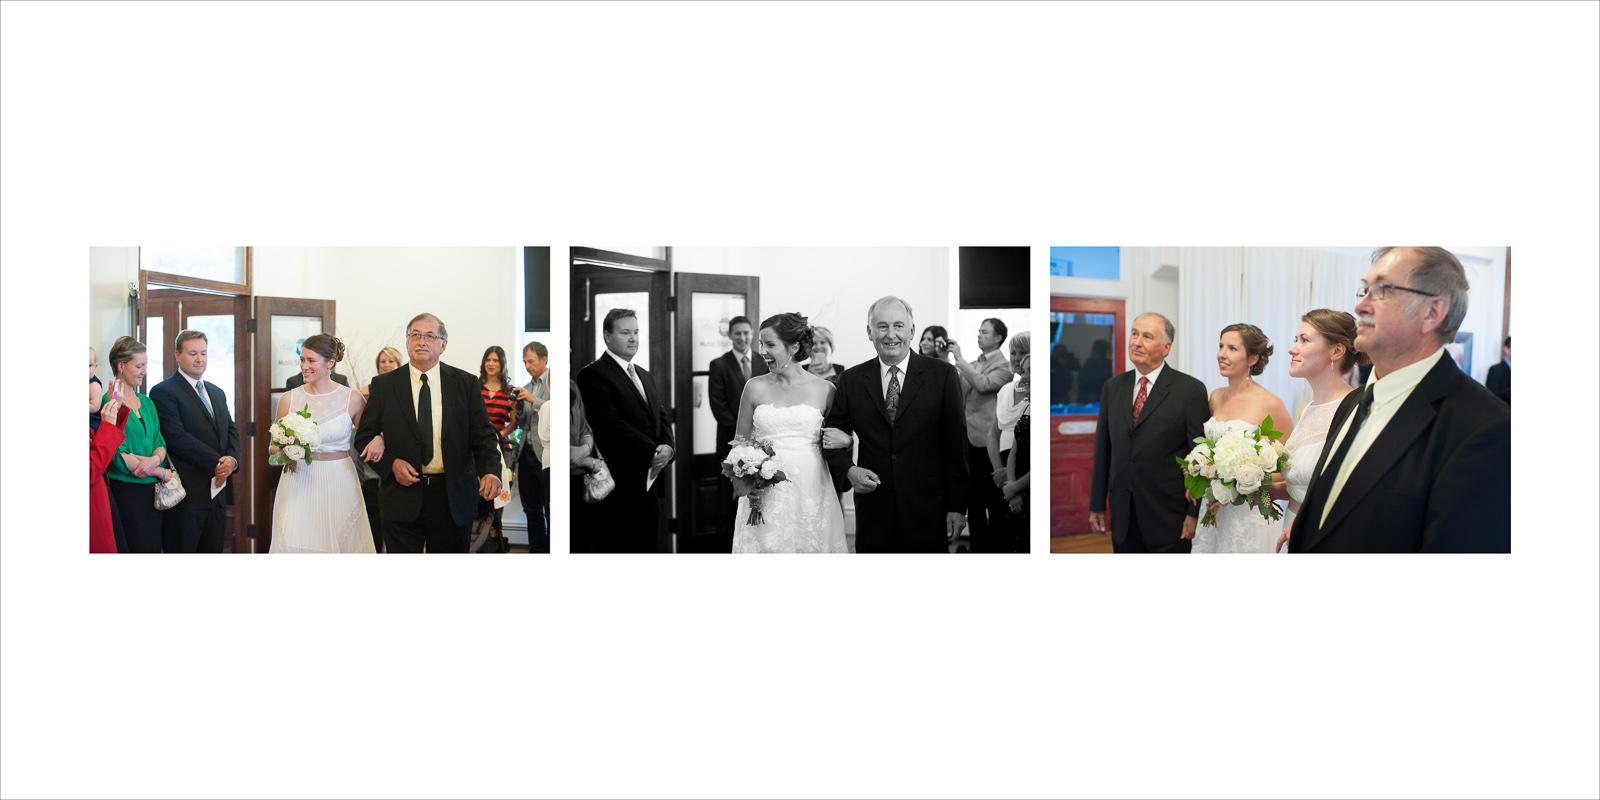 collingwood-wedding-photo-album-010.jpg